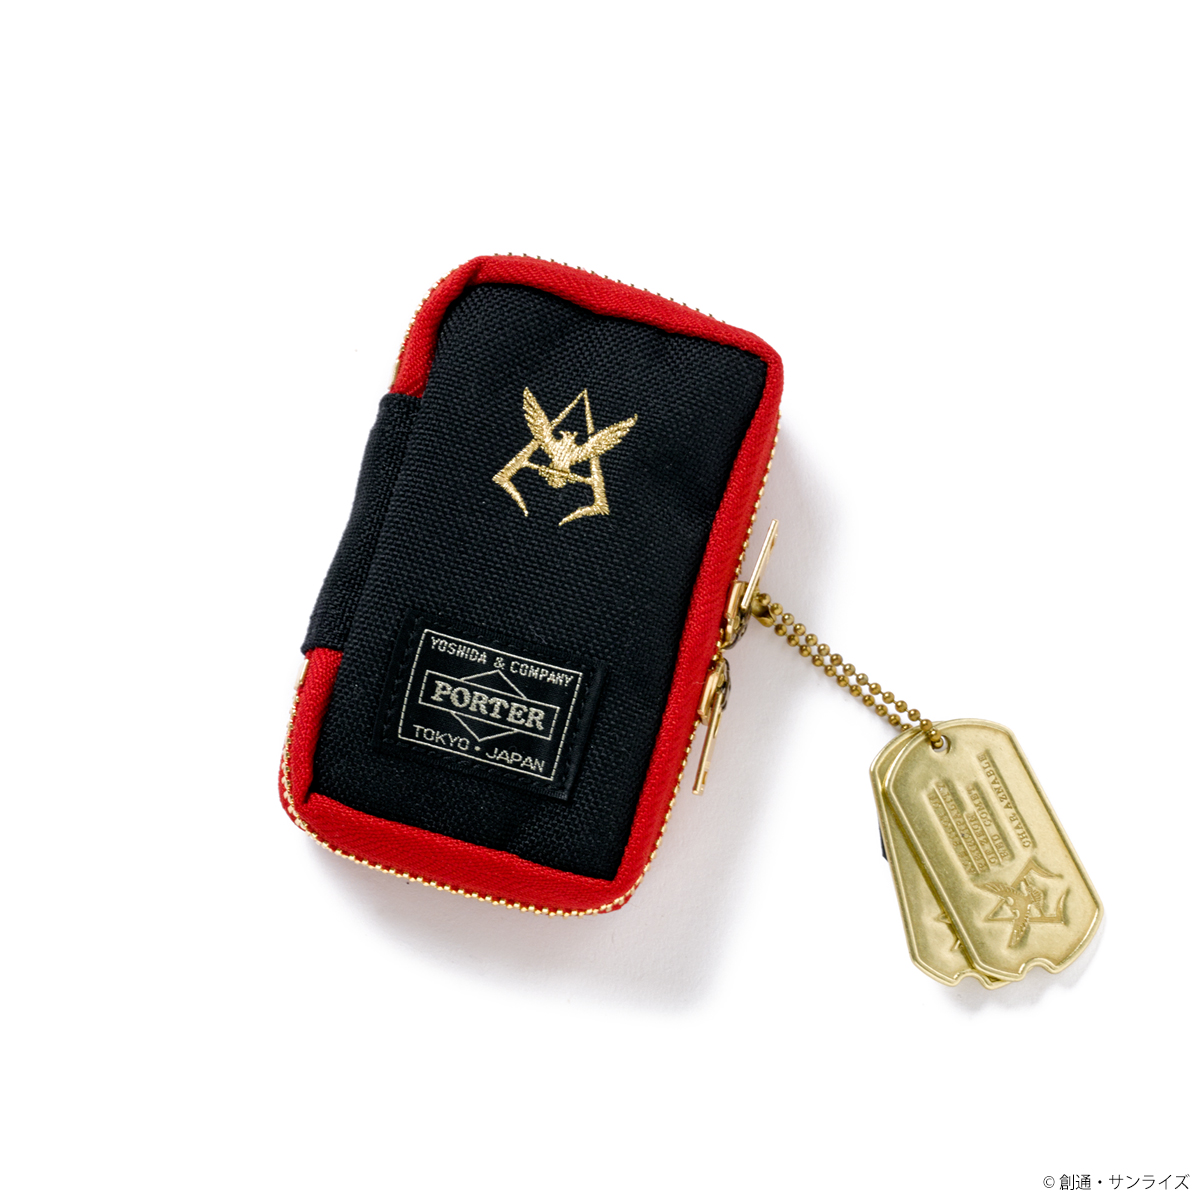 PORTER 鑰匙包 夏亞規格